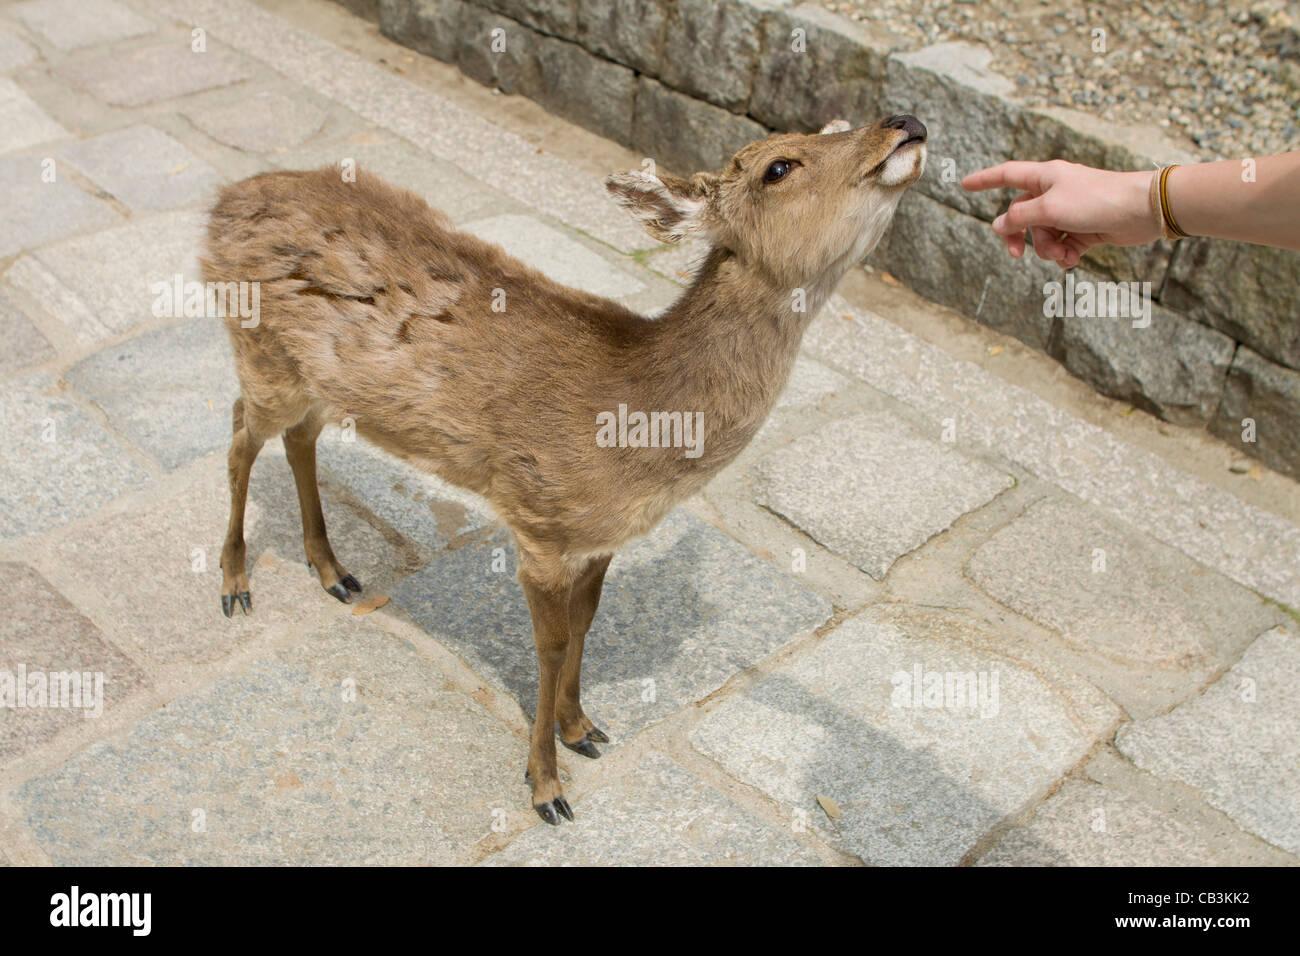 Feeding the holy deer in Nara, Japan. - Stock Image